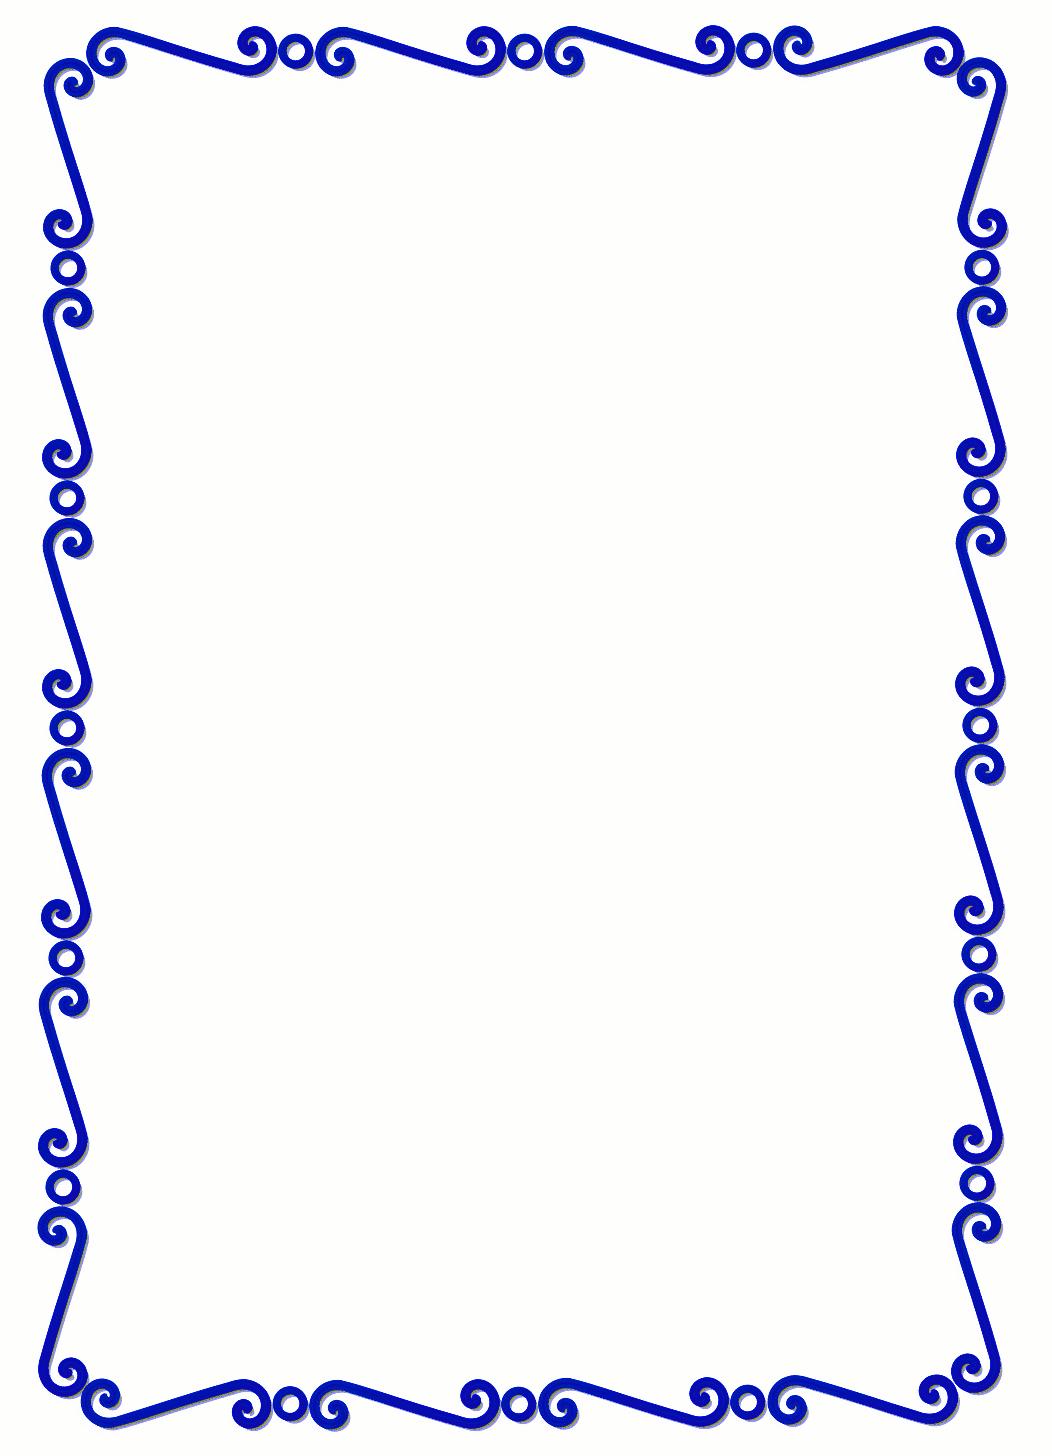 Free microsoft clipart borders transparent download Free Page Borders For Microsoft Word, Download Free Clip Art, Free ... transparent download